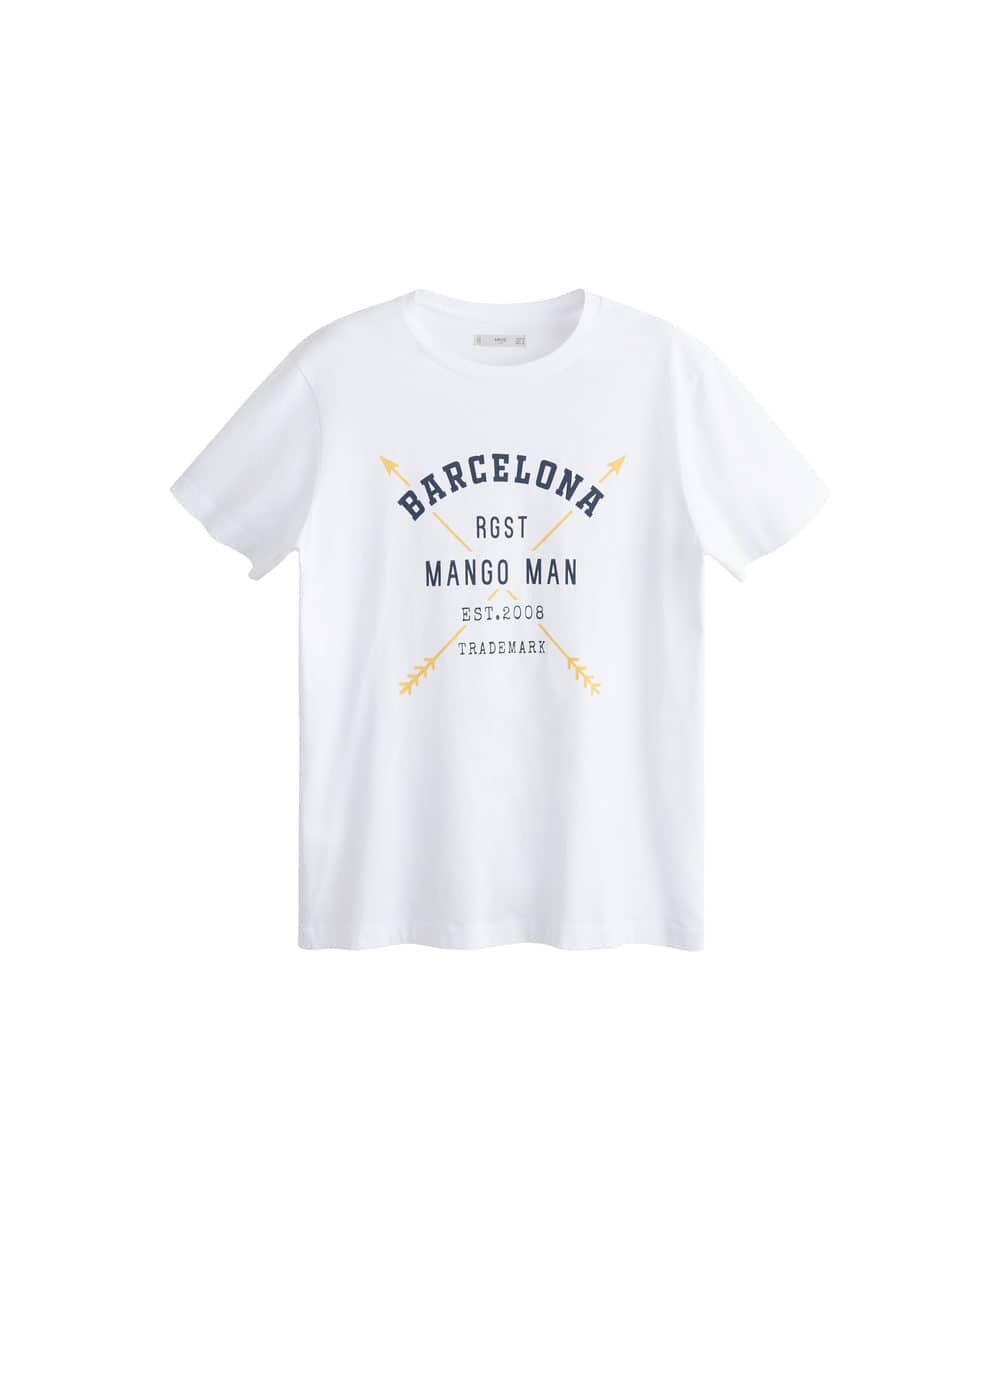 h-logohe-h:camiseta algodon estampado logo